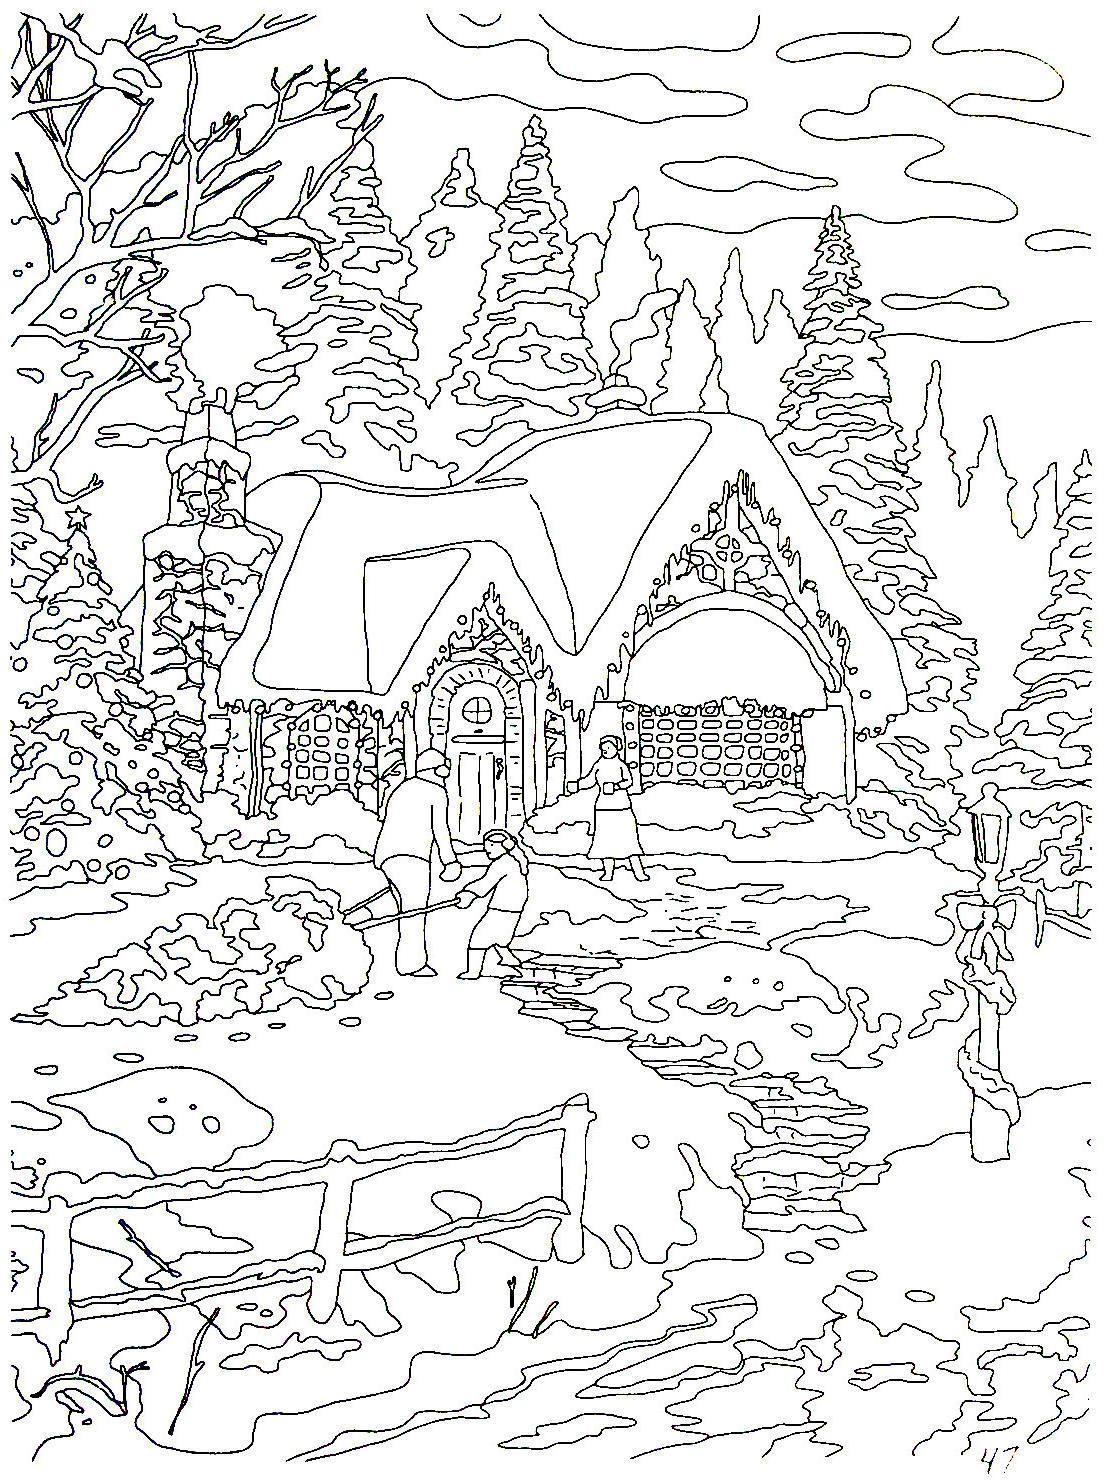 Country Christmas Homecoming Thomas Kinkade Painting Coloring Book Printable Page Coloring Books Coloring Pages Christmas Coloring Pages